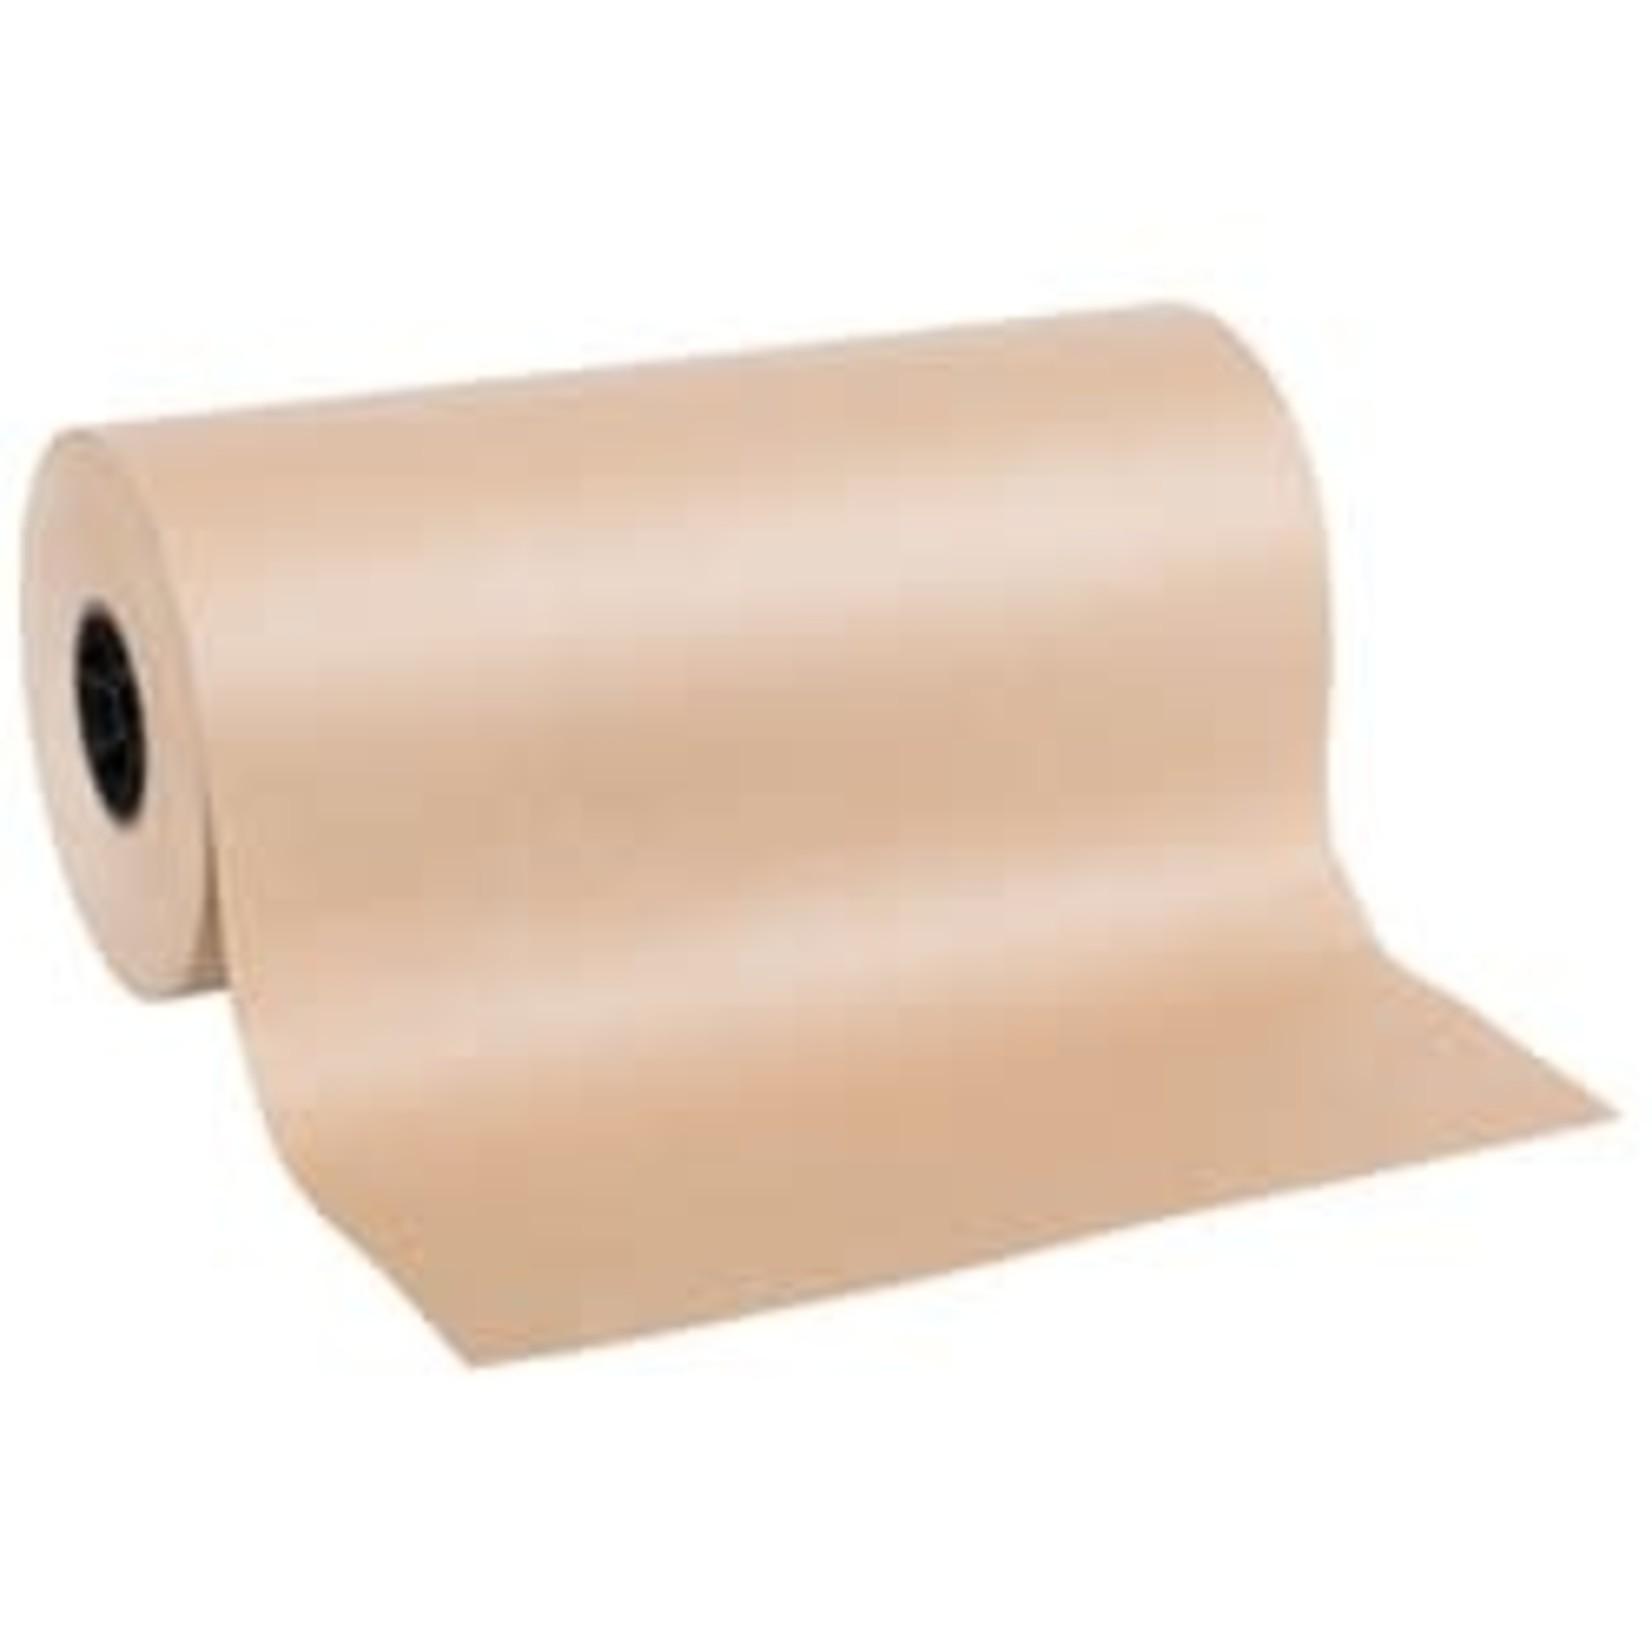 "24"" 40# Natural Kraft Paper Roll"